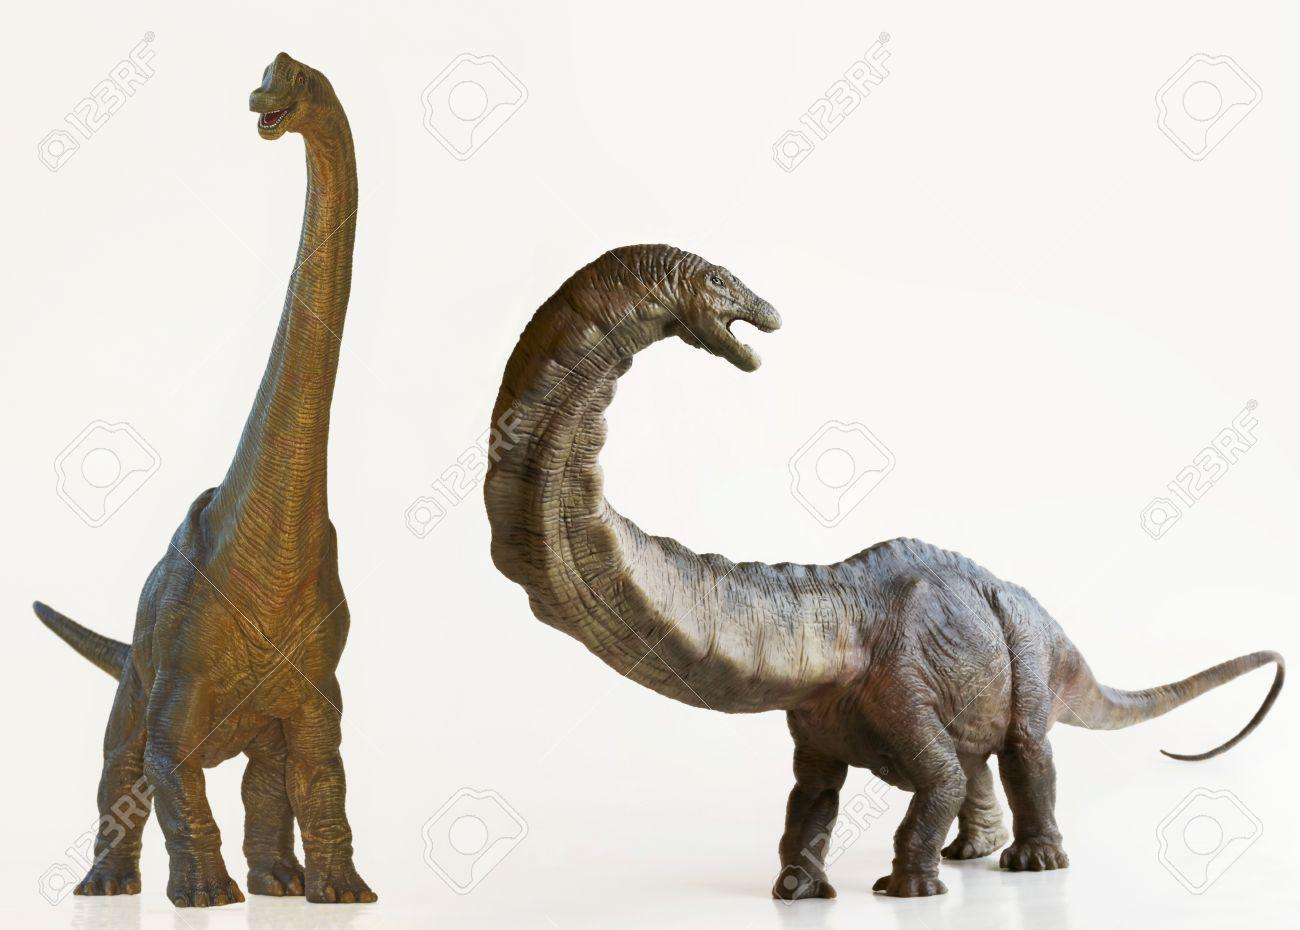 a brachiosaurus dinosaur next to an apatosaurus both are sauropods